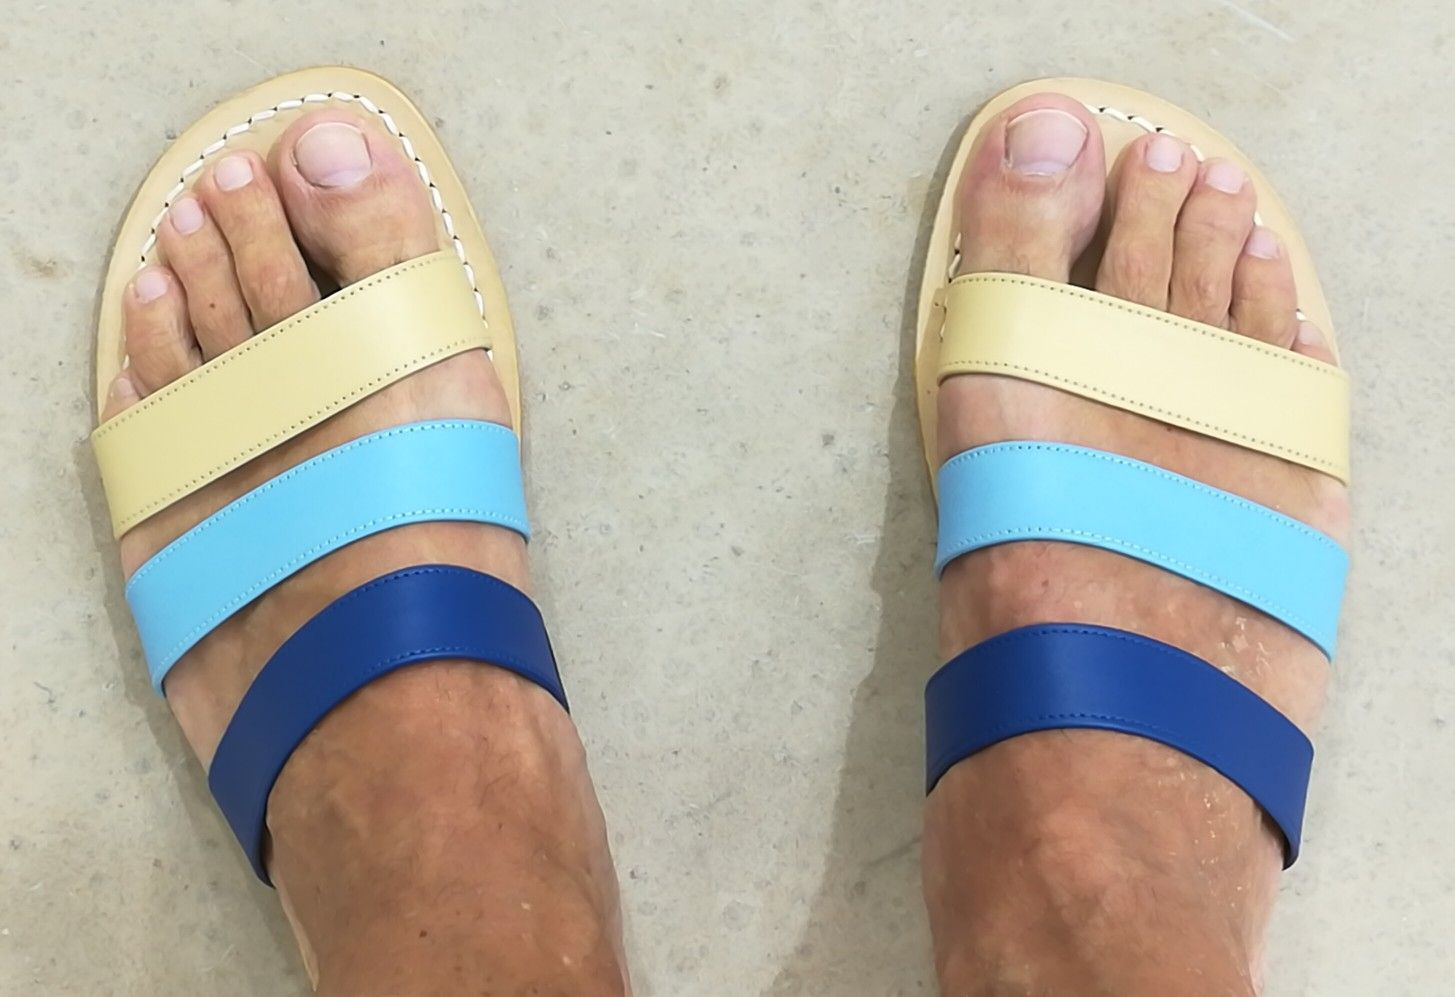 Handcrafted sandals tricolor for man.  Dea Sandals Capri Shop at www.deasandals.com #capri #sandals #handcrafted #fashion #style #outfit #moda #sandalsman #man #leather #custom #deasandals #deacapri